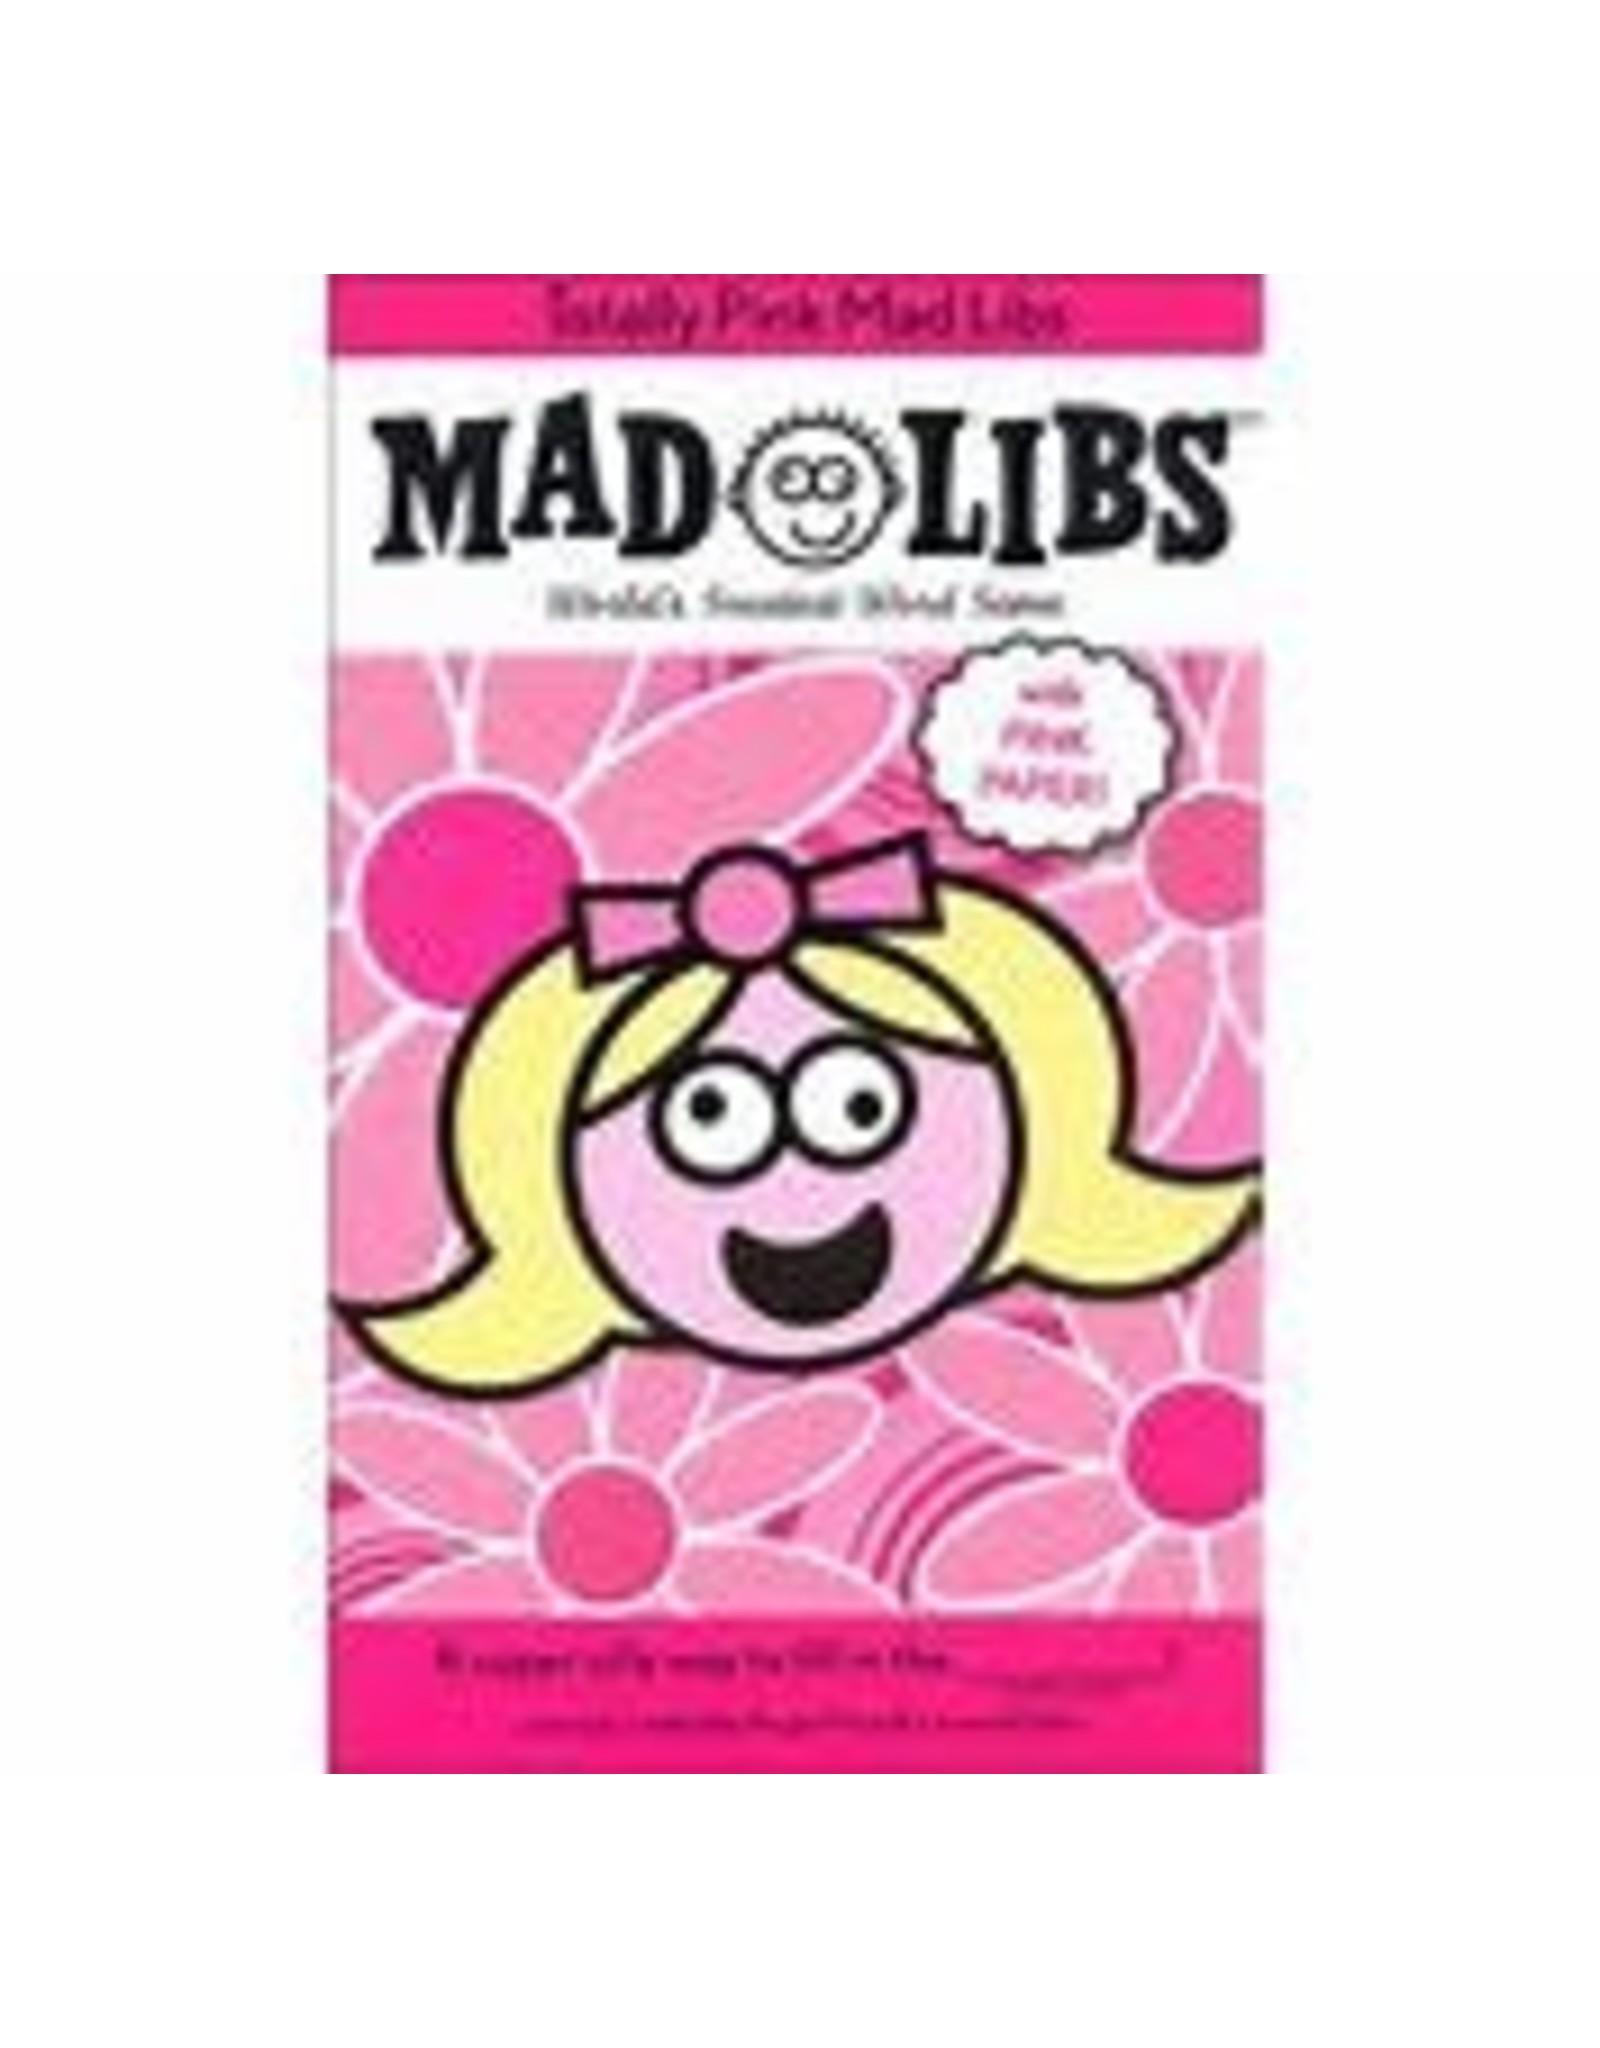 MadLibs Madlibs, Totally Pink